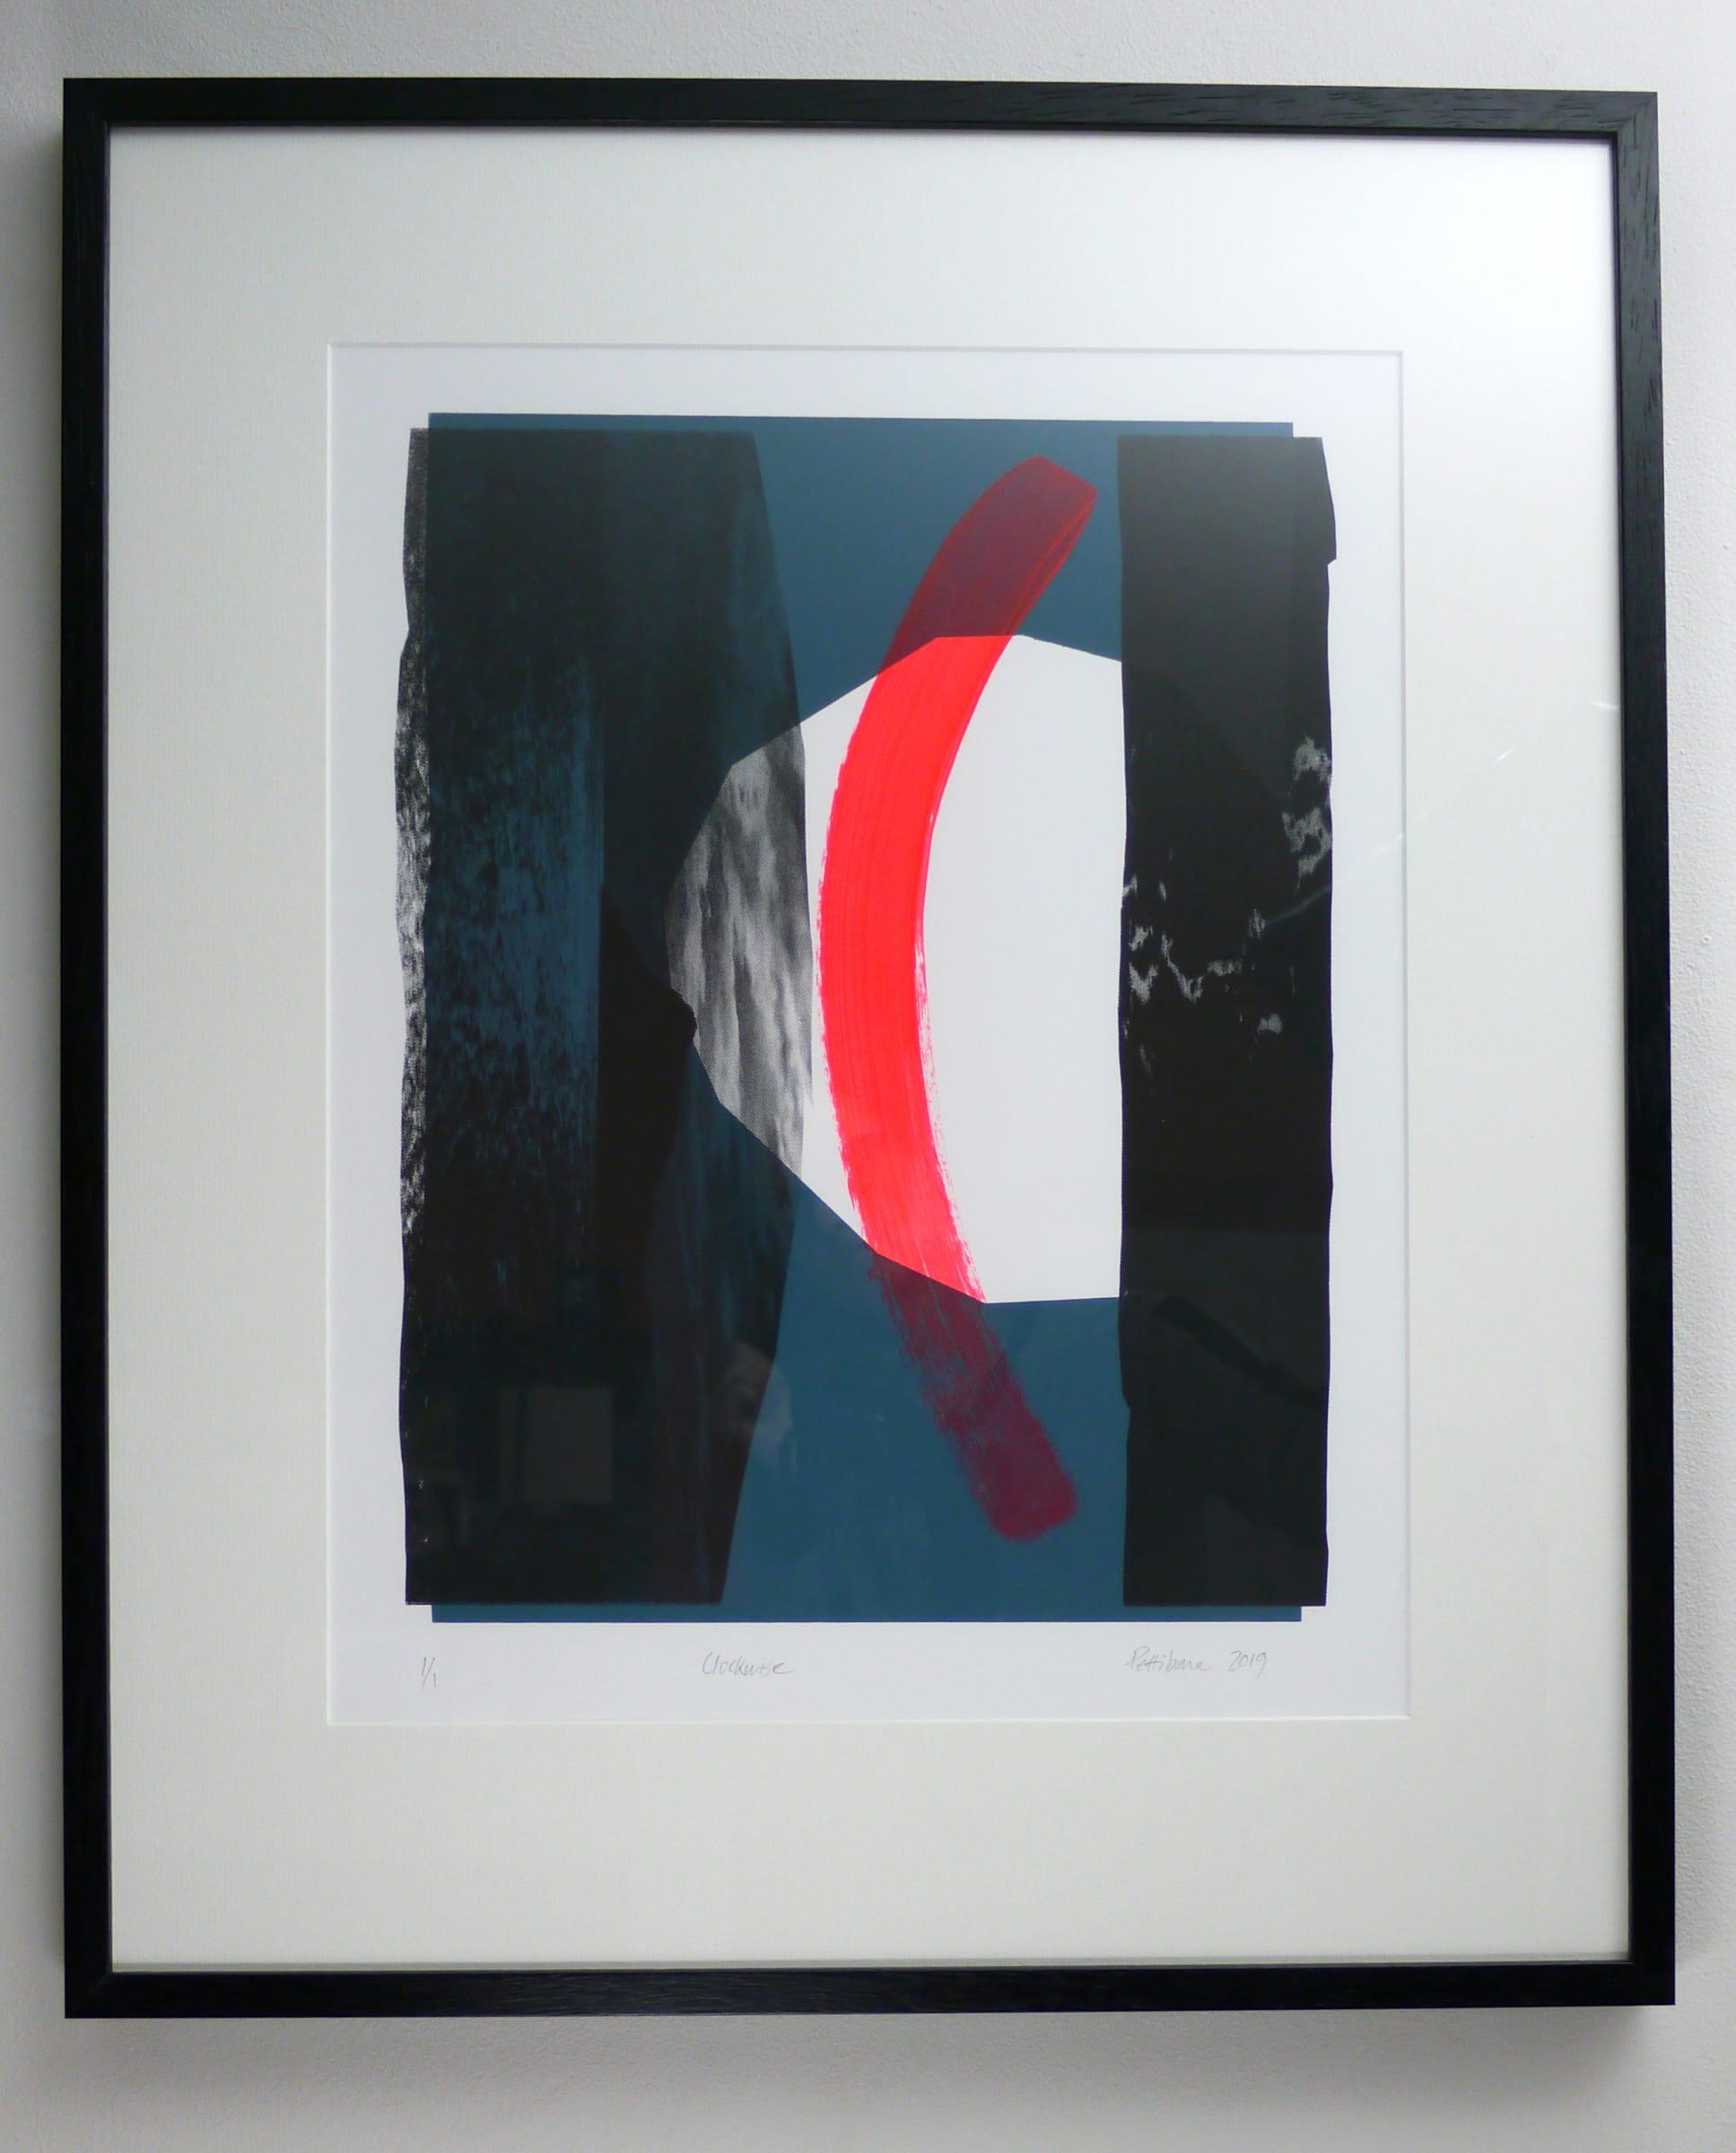 "<span class=""link fancybox-details-link""><a href=""/artists/194-lisa-pettibone/works/6667-lisa-pettibone-clockwise-2019/"">View Detail Page</a></span><div class=""artist""><strong>Lisa Pettibone</strong></div> b. 1960 <div class=""title""><em>Clockwise</em>, 2019</div> <div class=""medium"">Screen print, hand painted</div> <div class=""dimensions"">37 x 46cm</div> <div class=""edition_details"">1/1 - unique</div><div class=""price"">£300.00</div><div class=""copyright_line"">Copyright The Artist</div>"